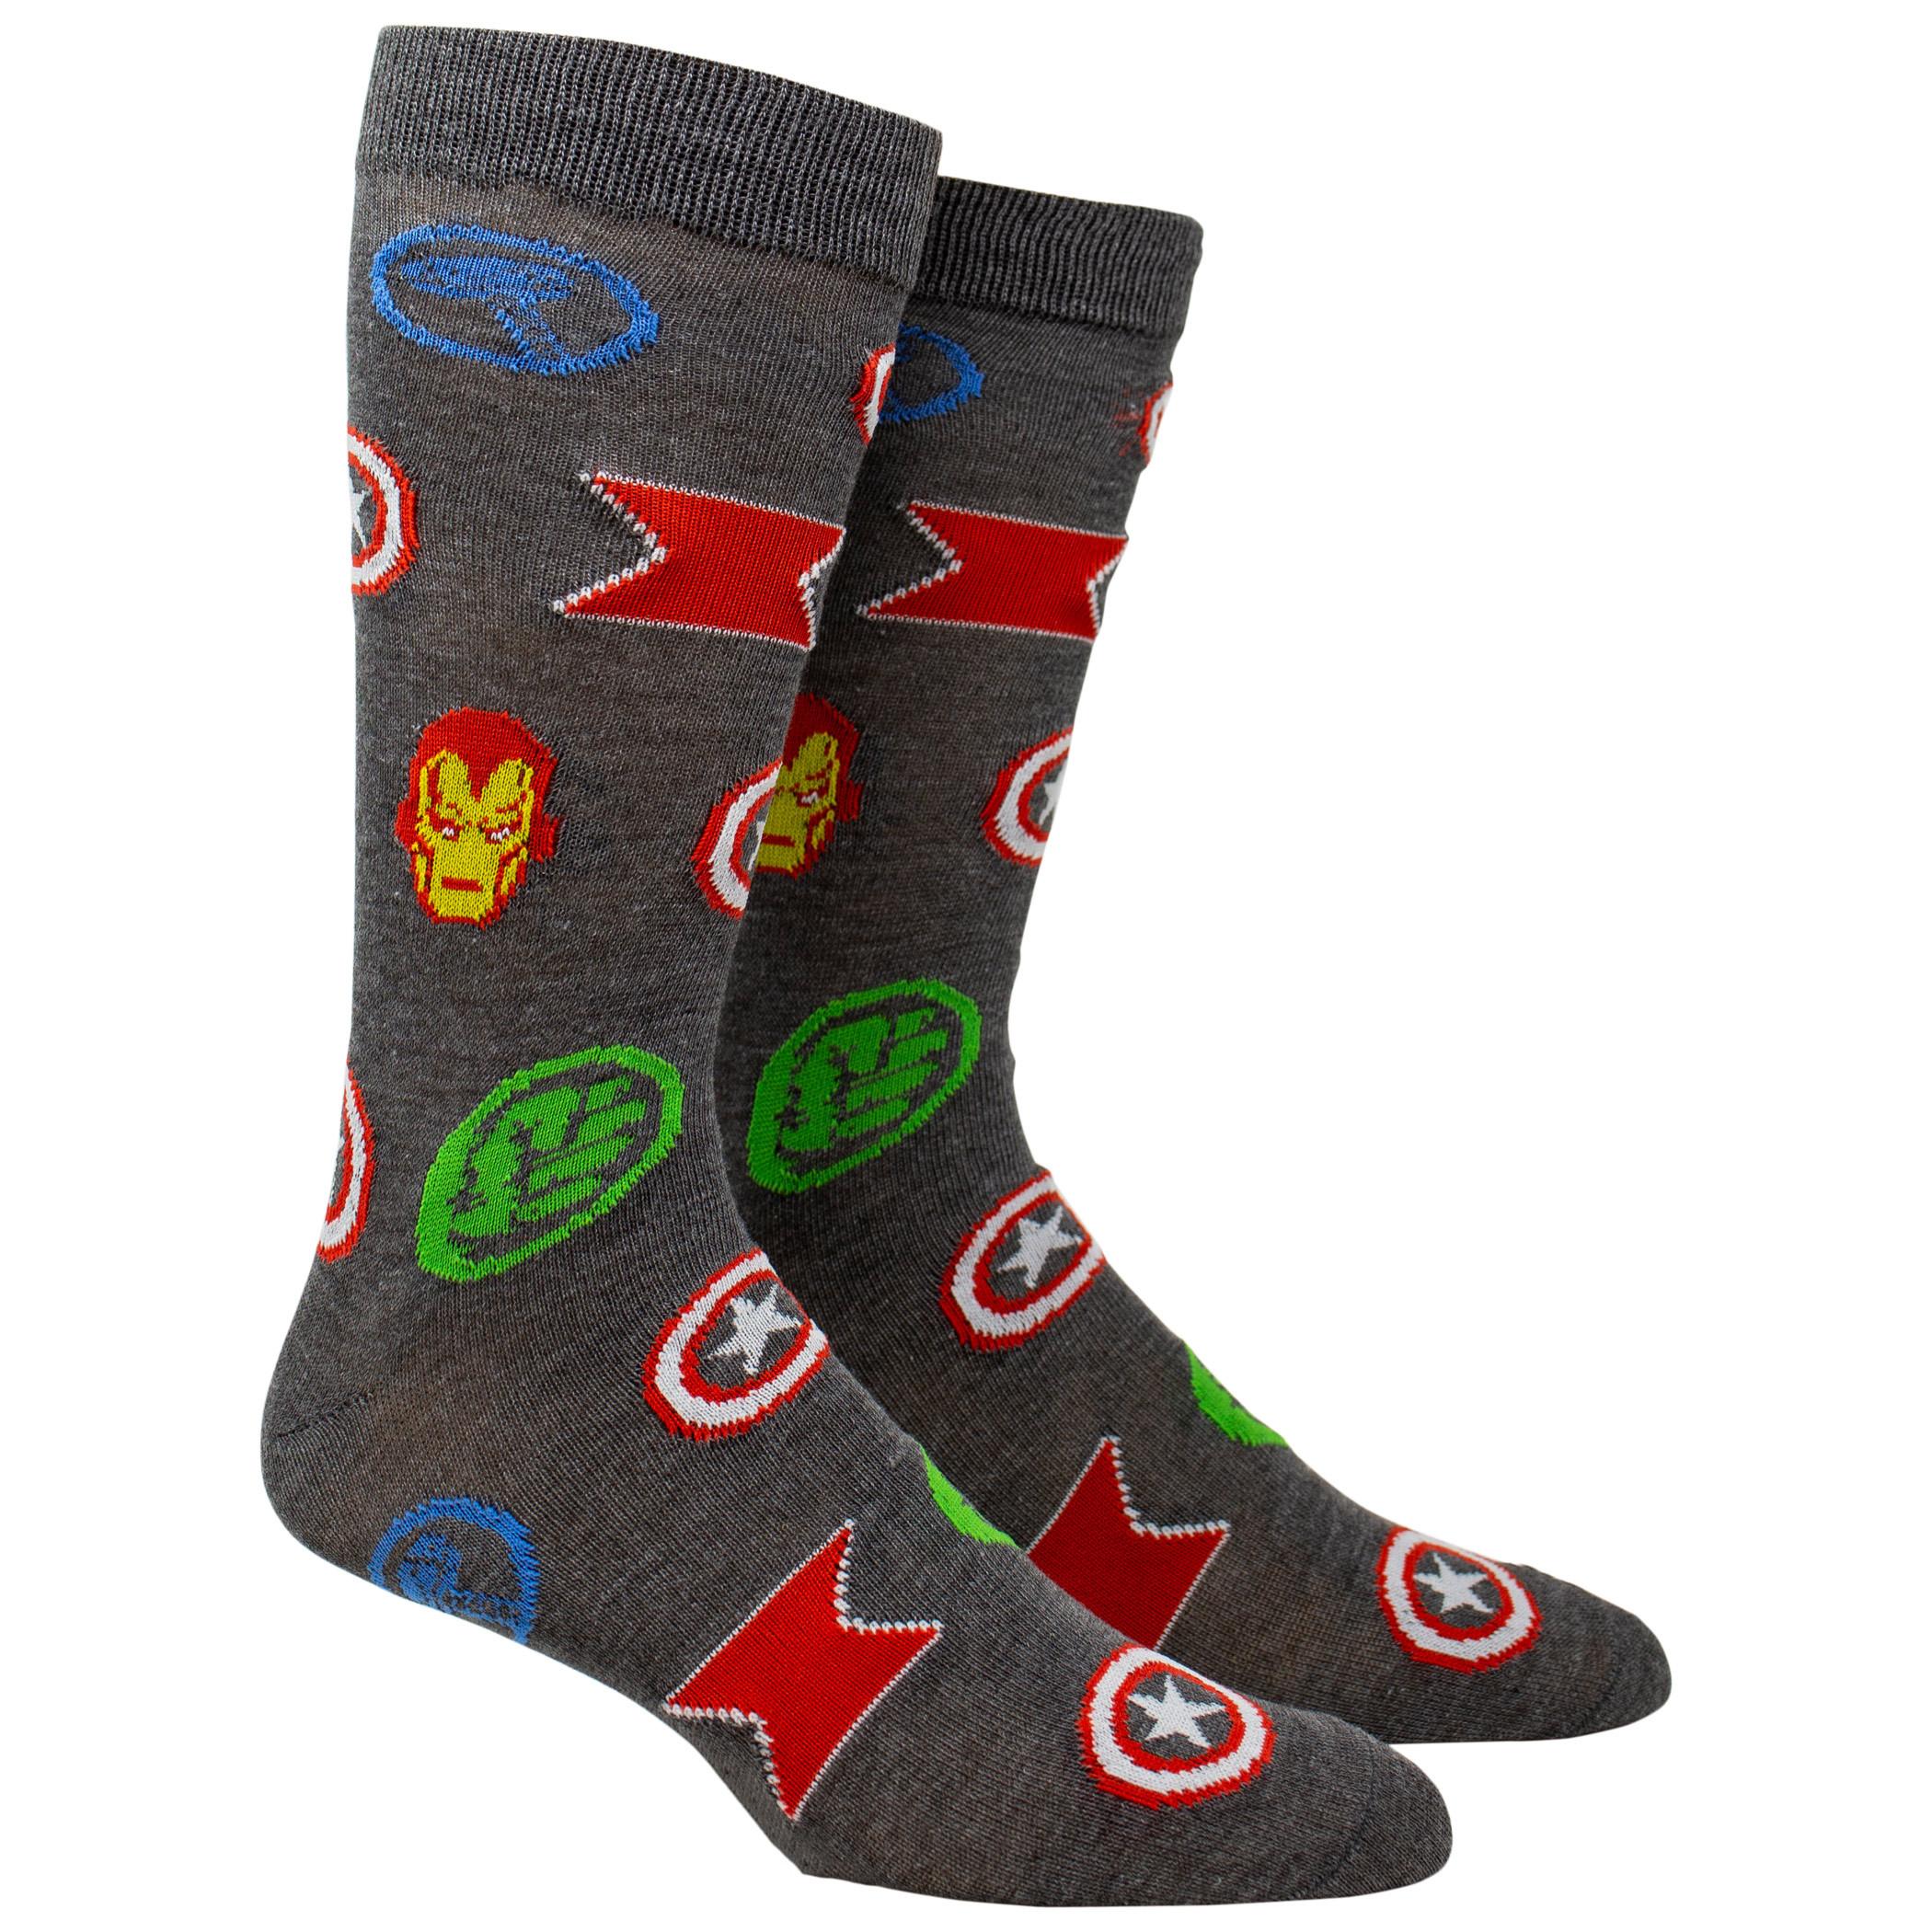 Iron Man and Avengers Hero Symbols 2-Pair Pack Casual Crew Socks